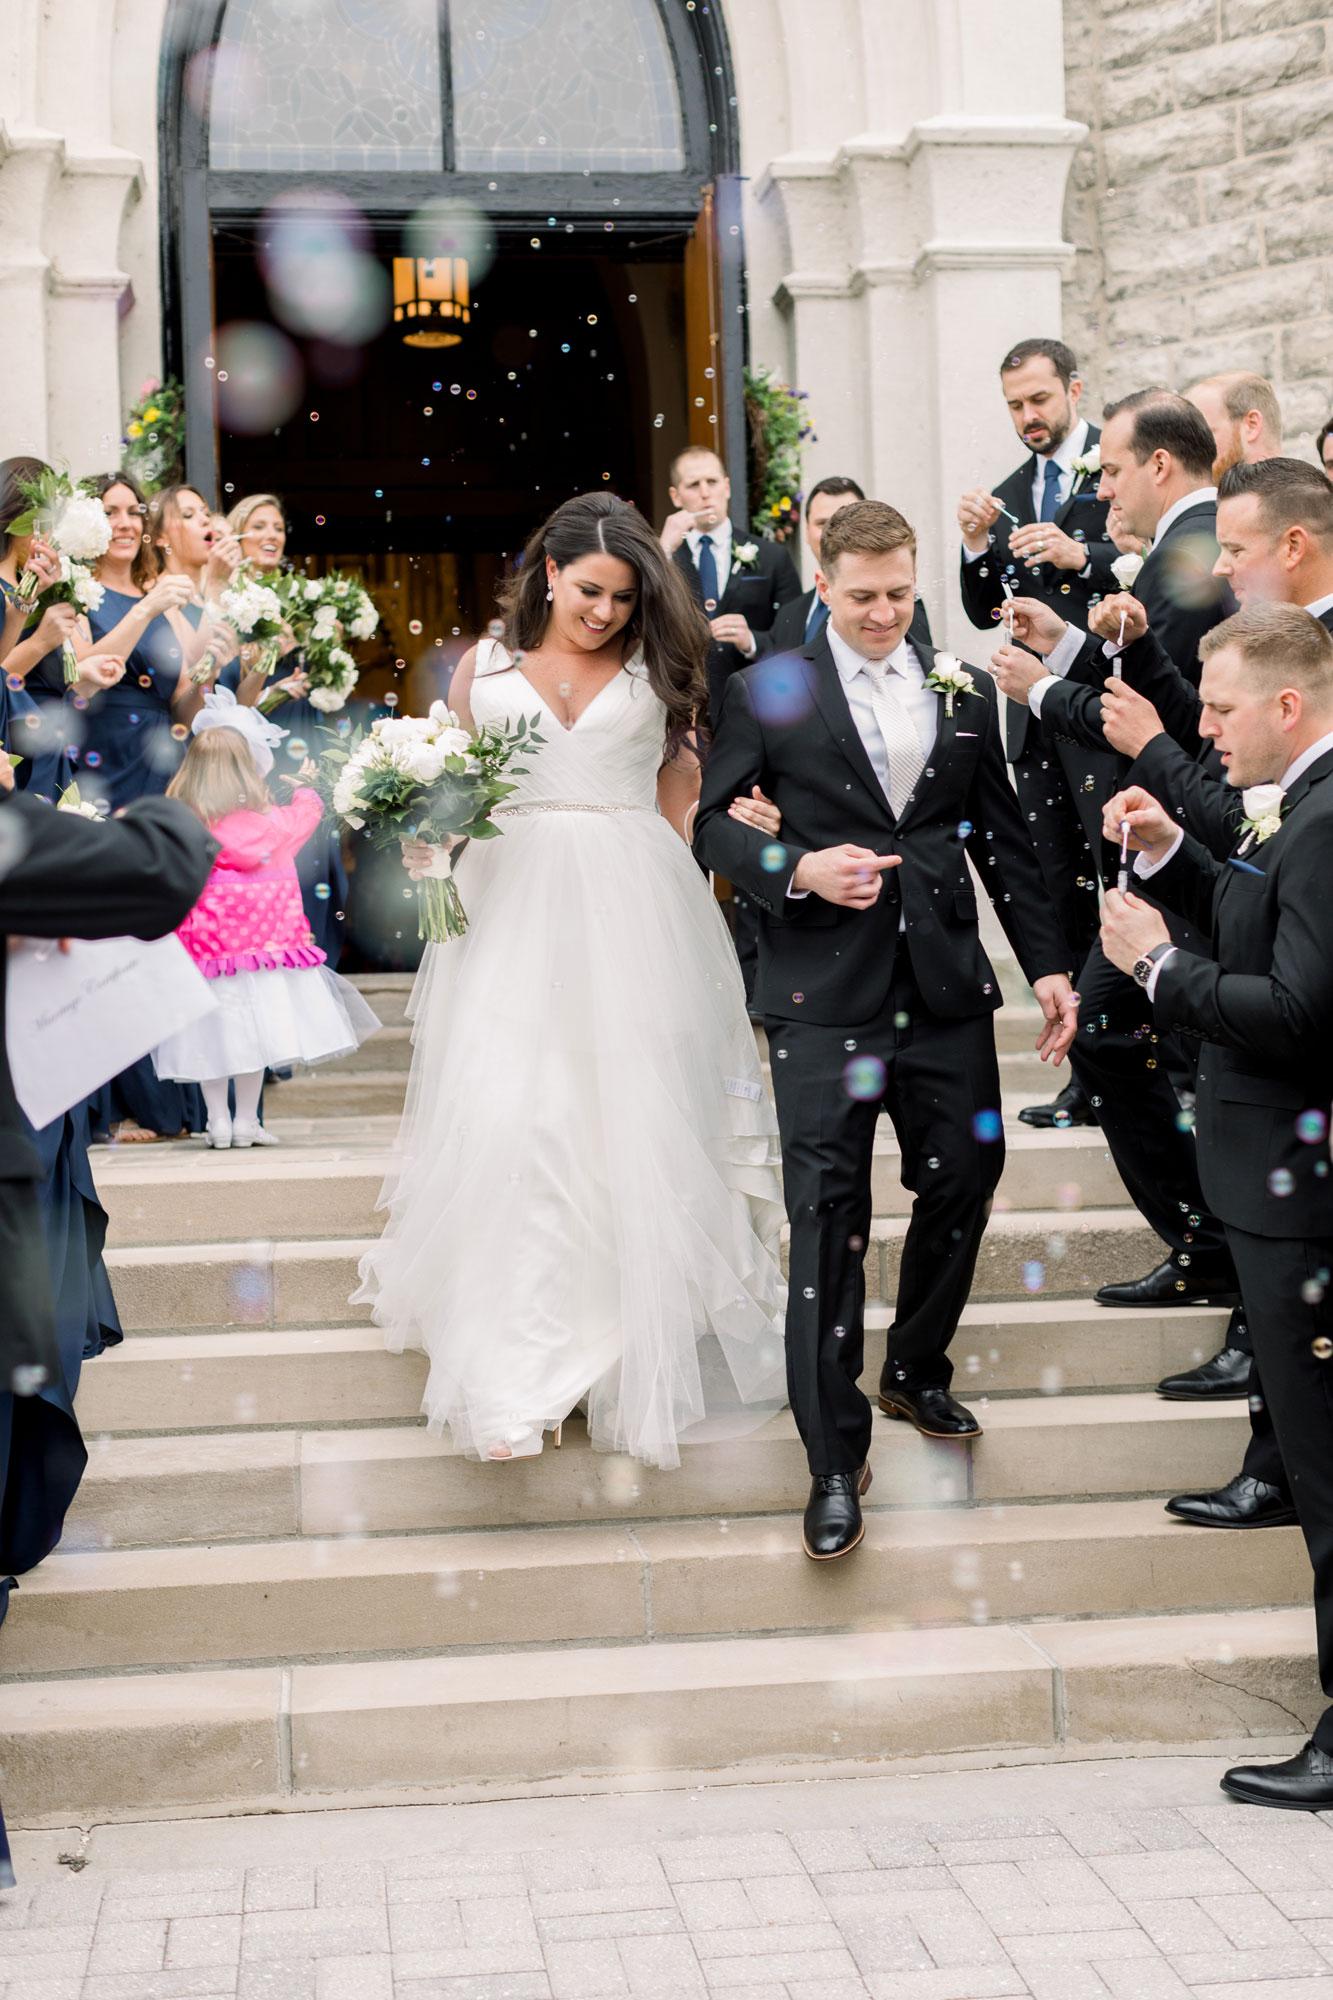 Konz-Bigaila-wedding-2017-52.jpg